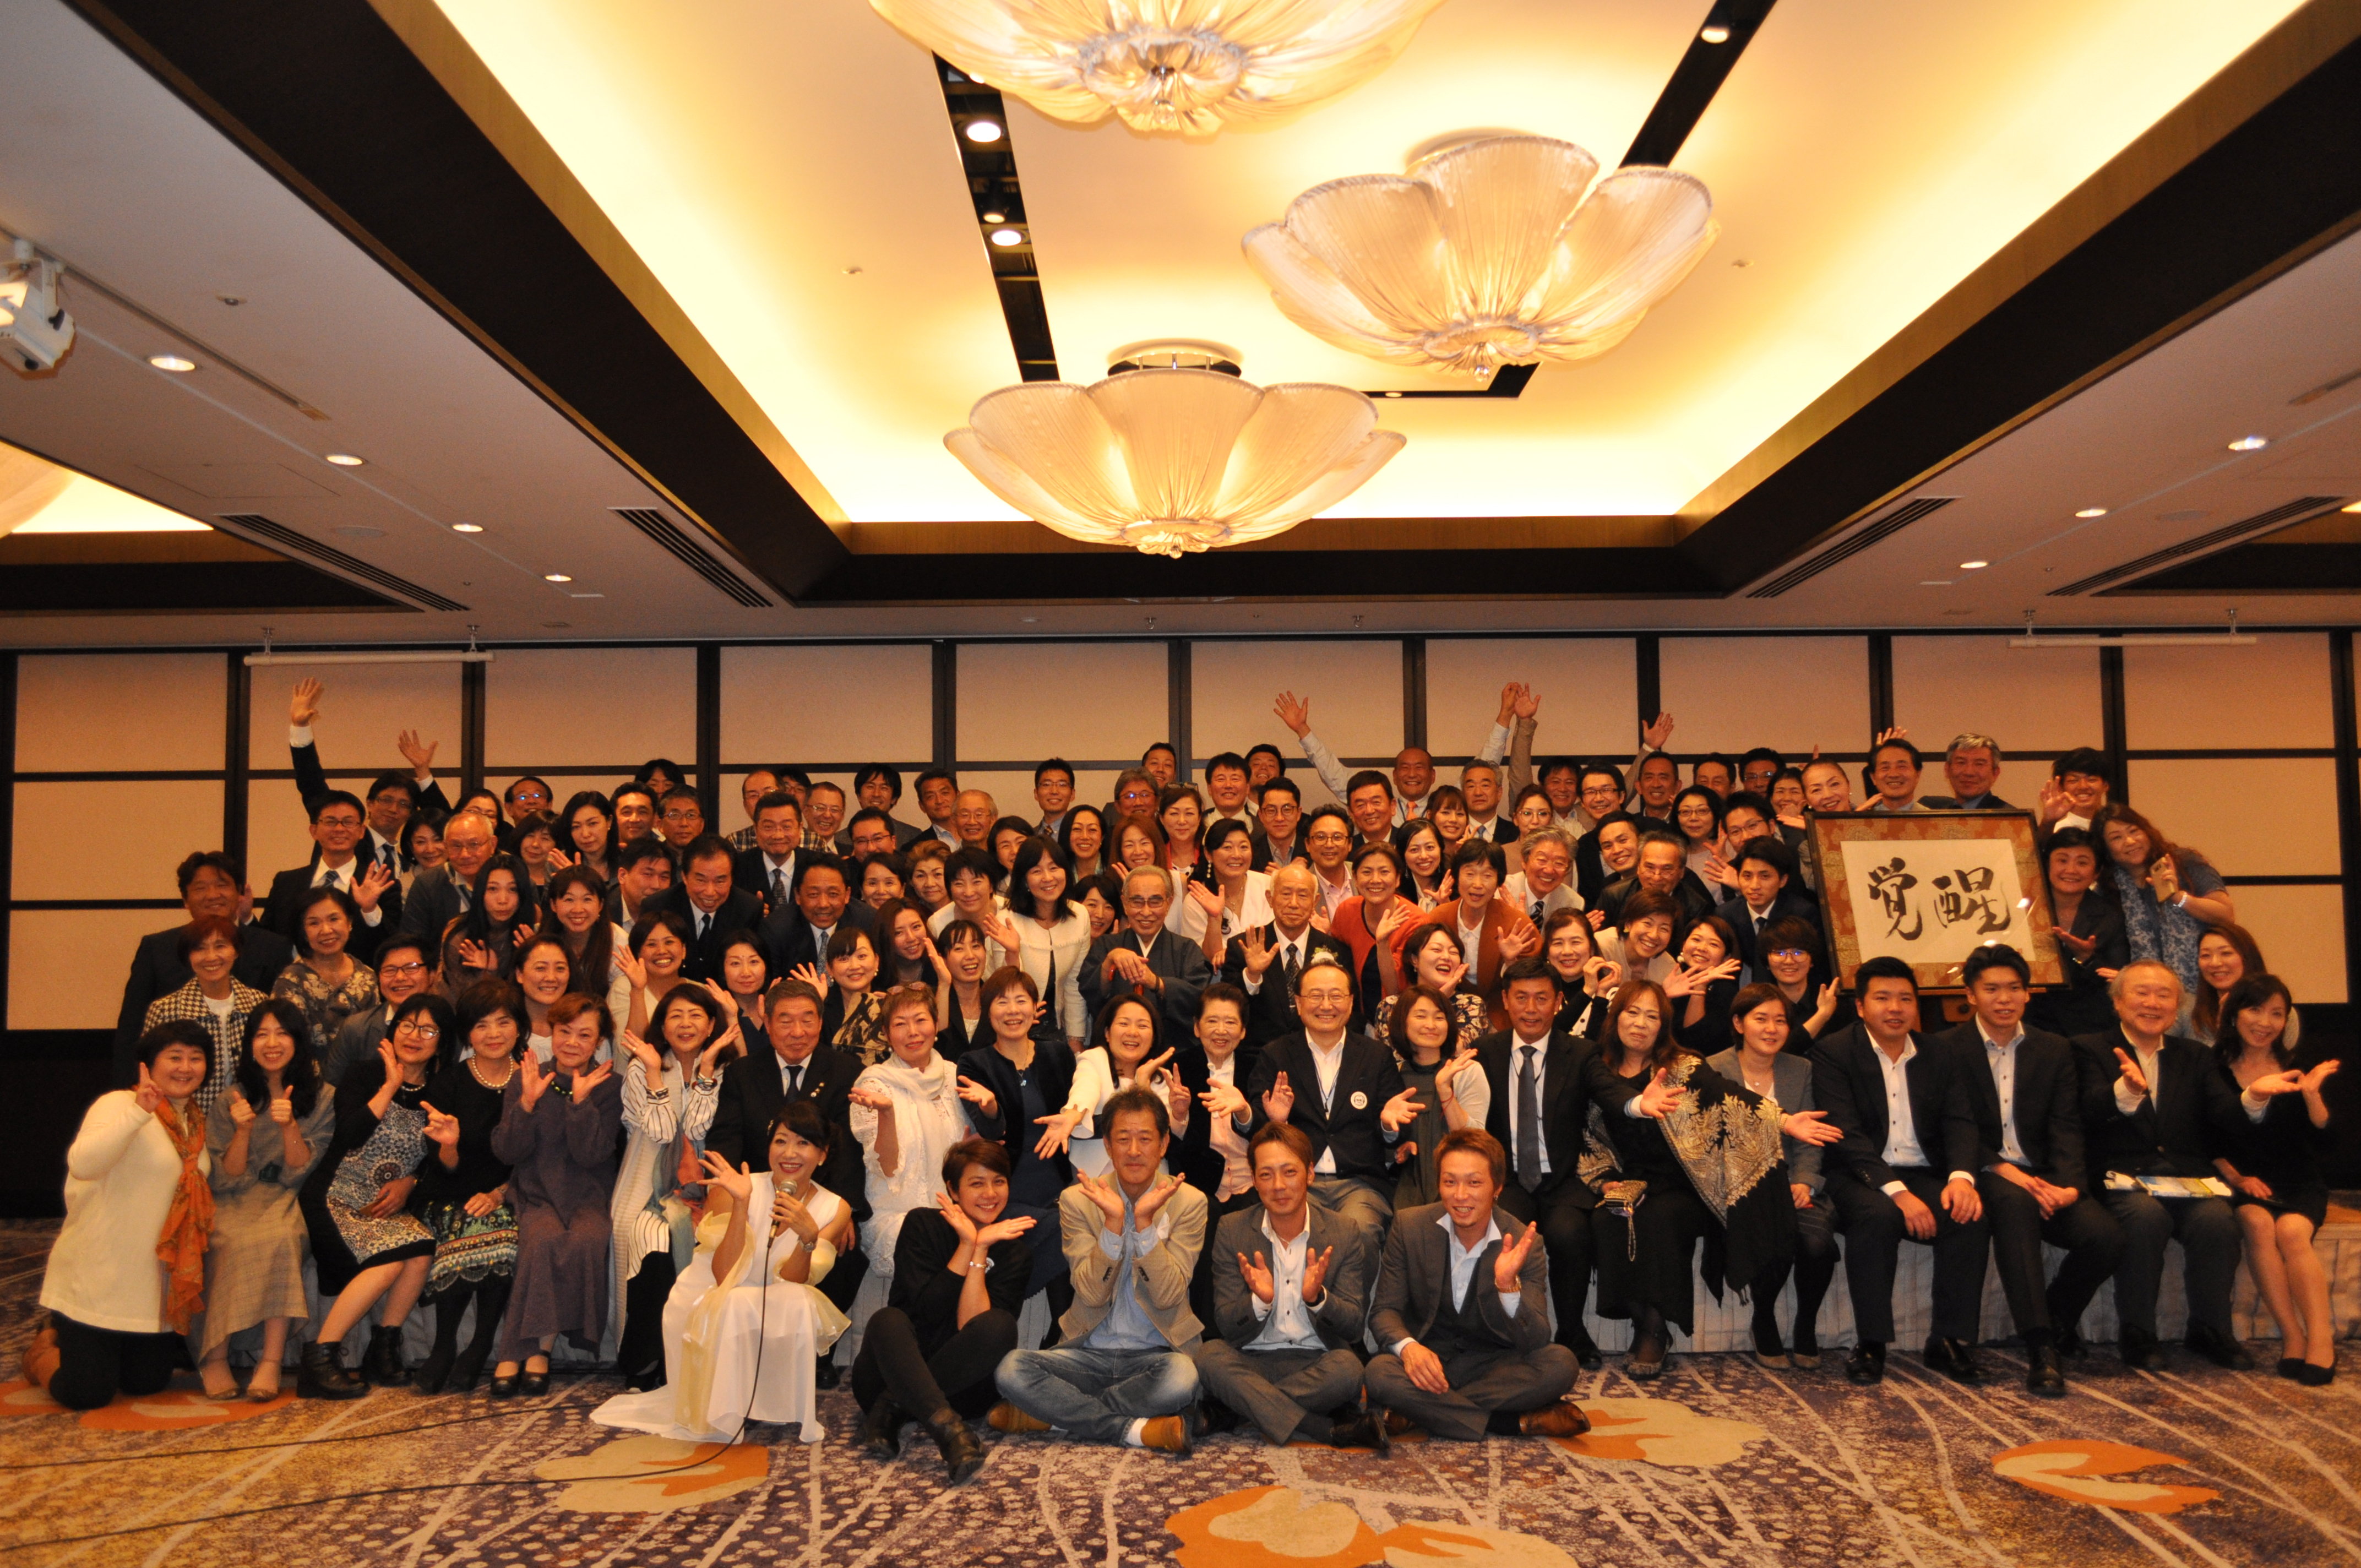 DSC 0609 - 第6回思風会全国大会2018in東京開催